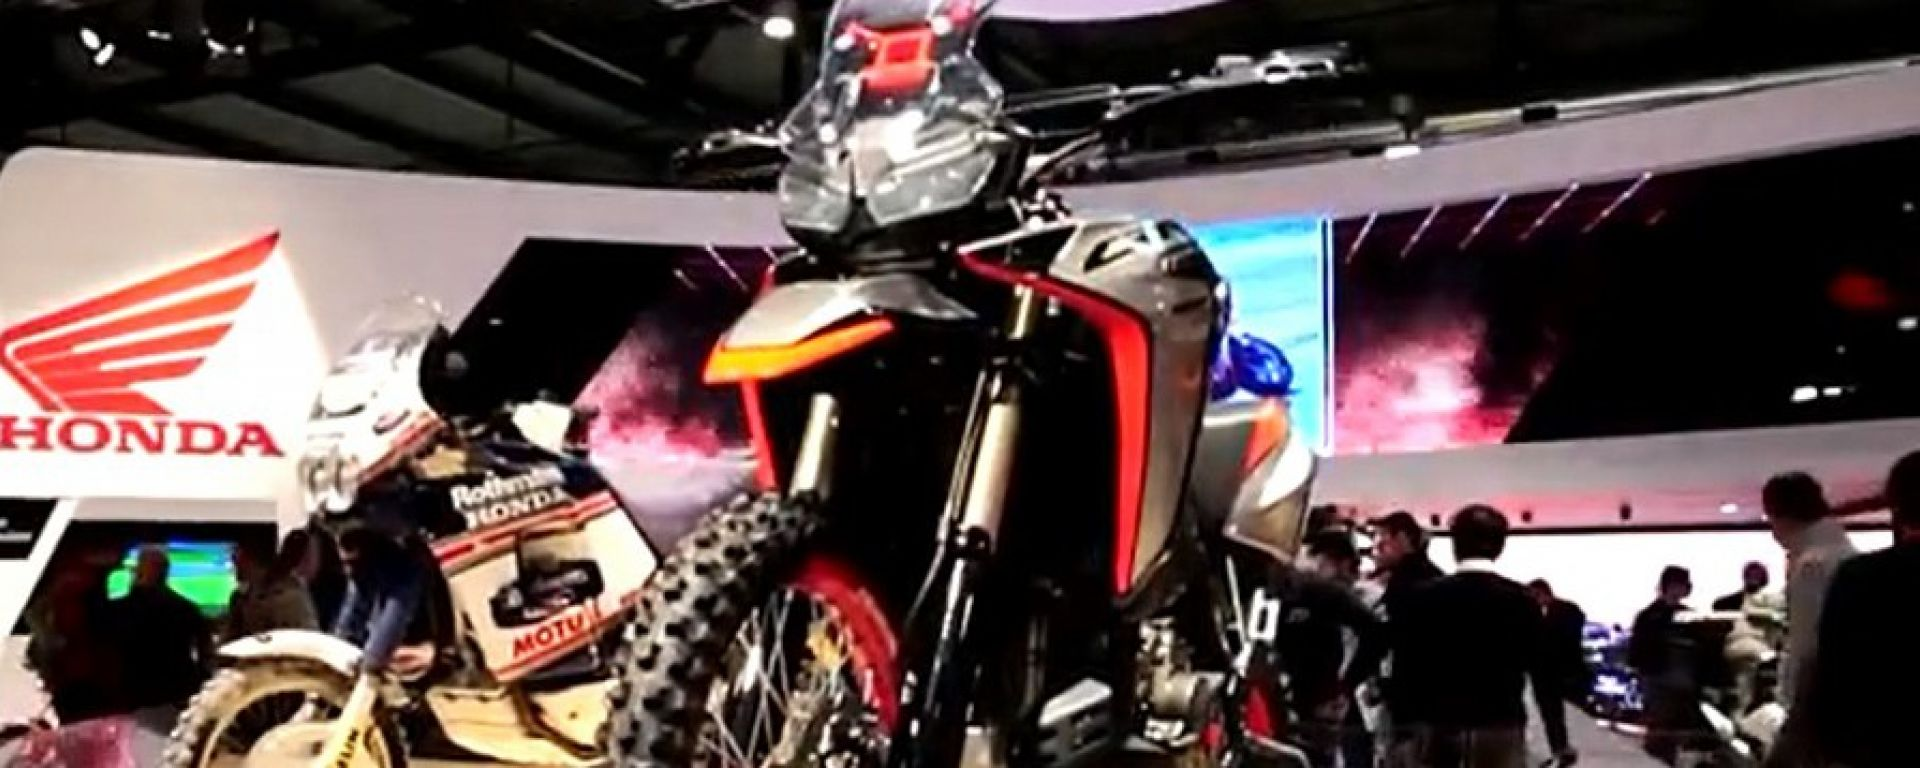 Honda CRF 1000 Sport Concept